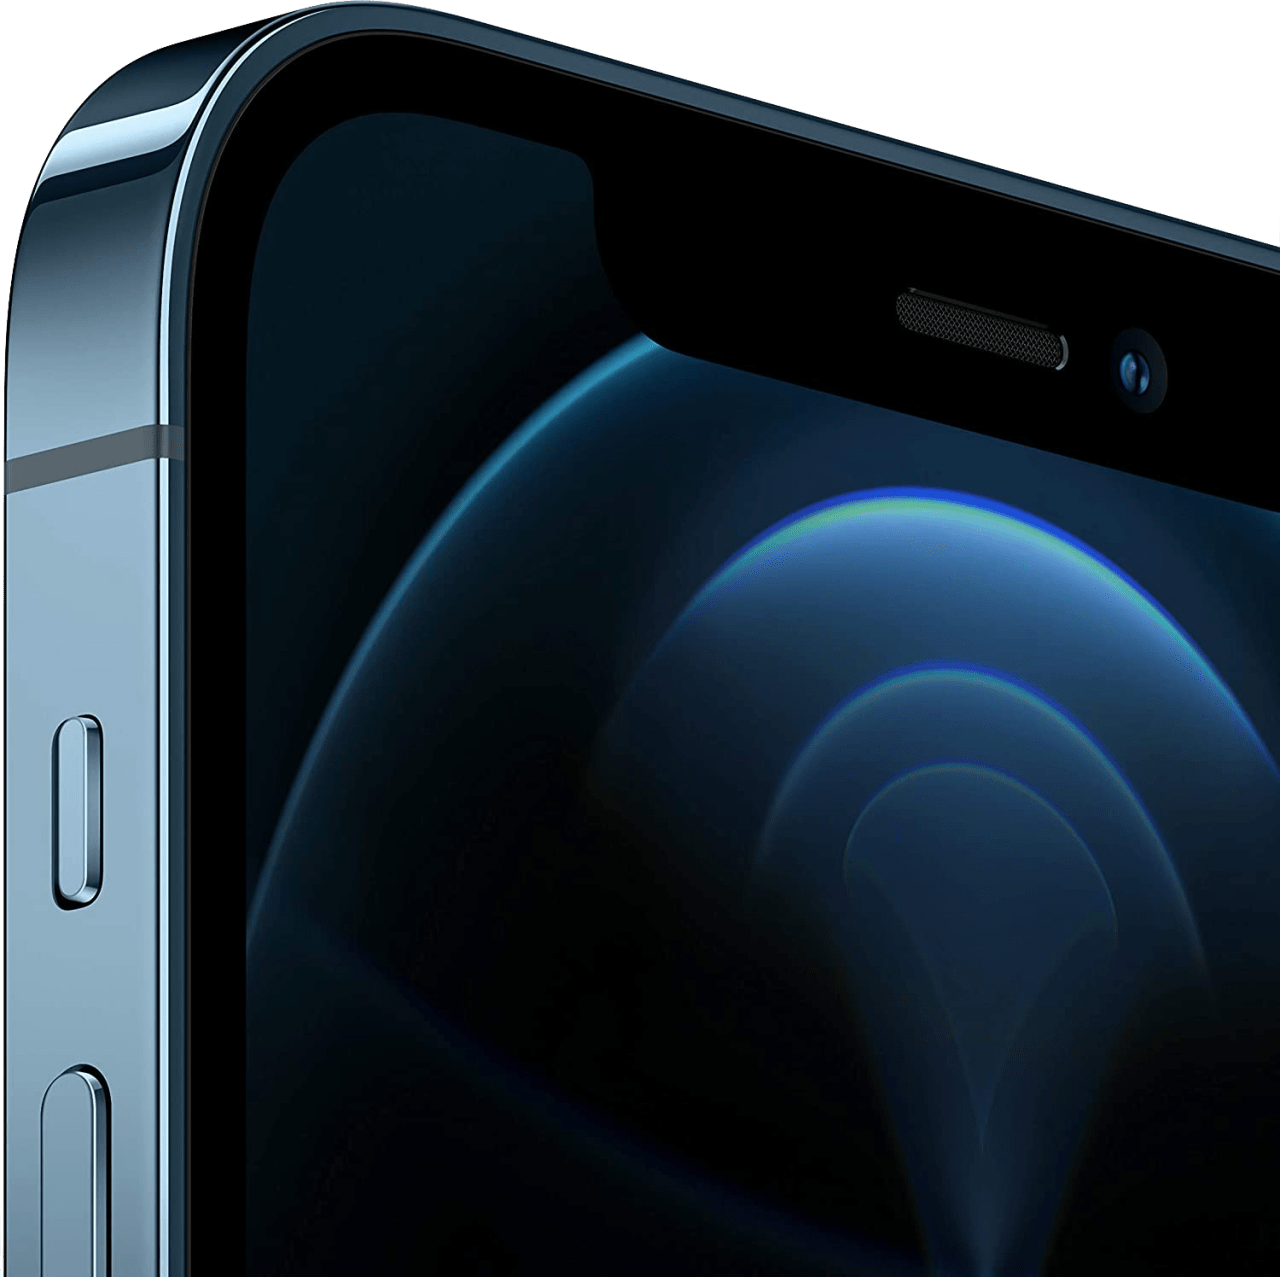 Pacific Blue Apple iPhone 12 Pro 256GB.2